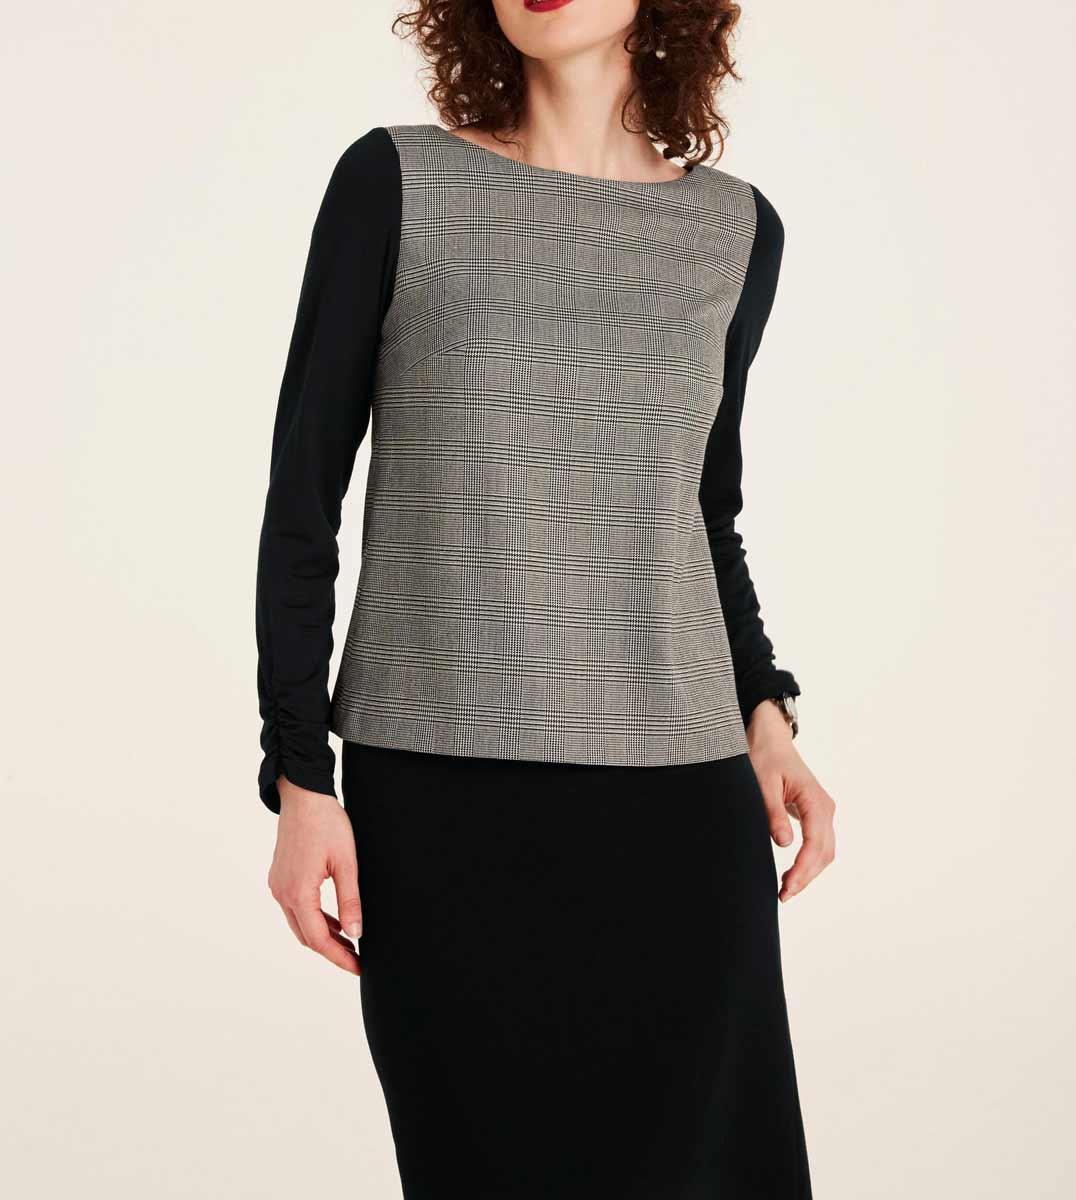 428.680 PATRIZIA DINI Damen Designer-Shirt Schwarz-Offwhite